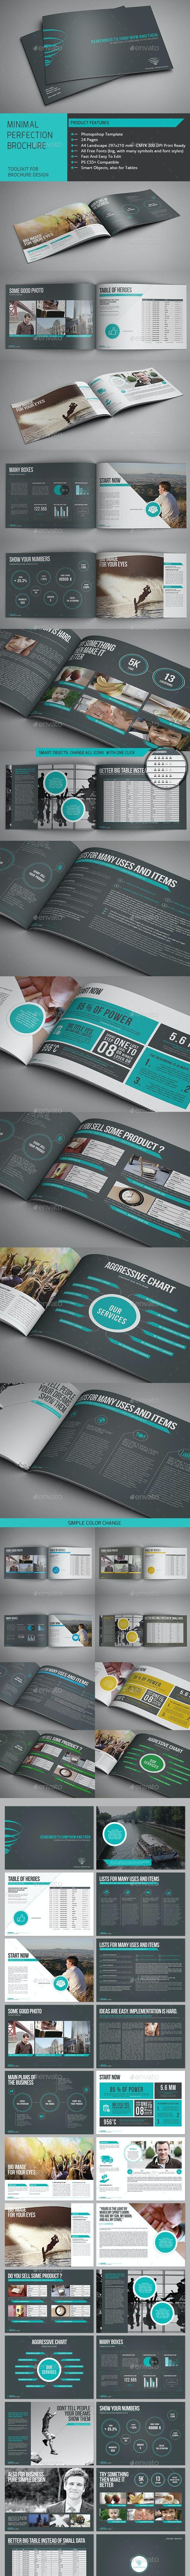 Minimal Perfection Brochure - Brochures Print Templates